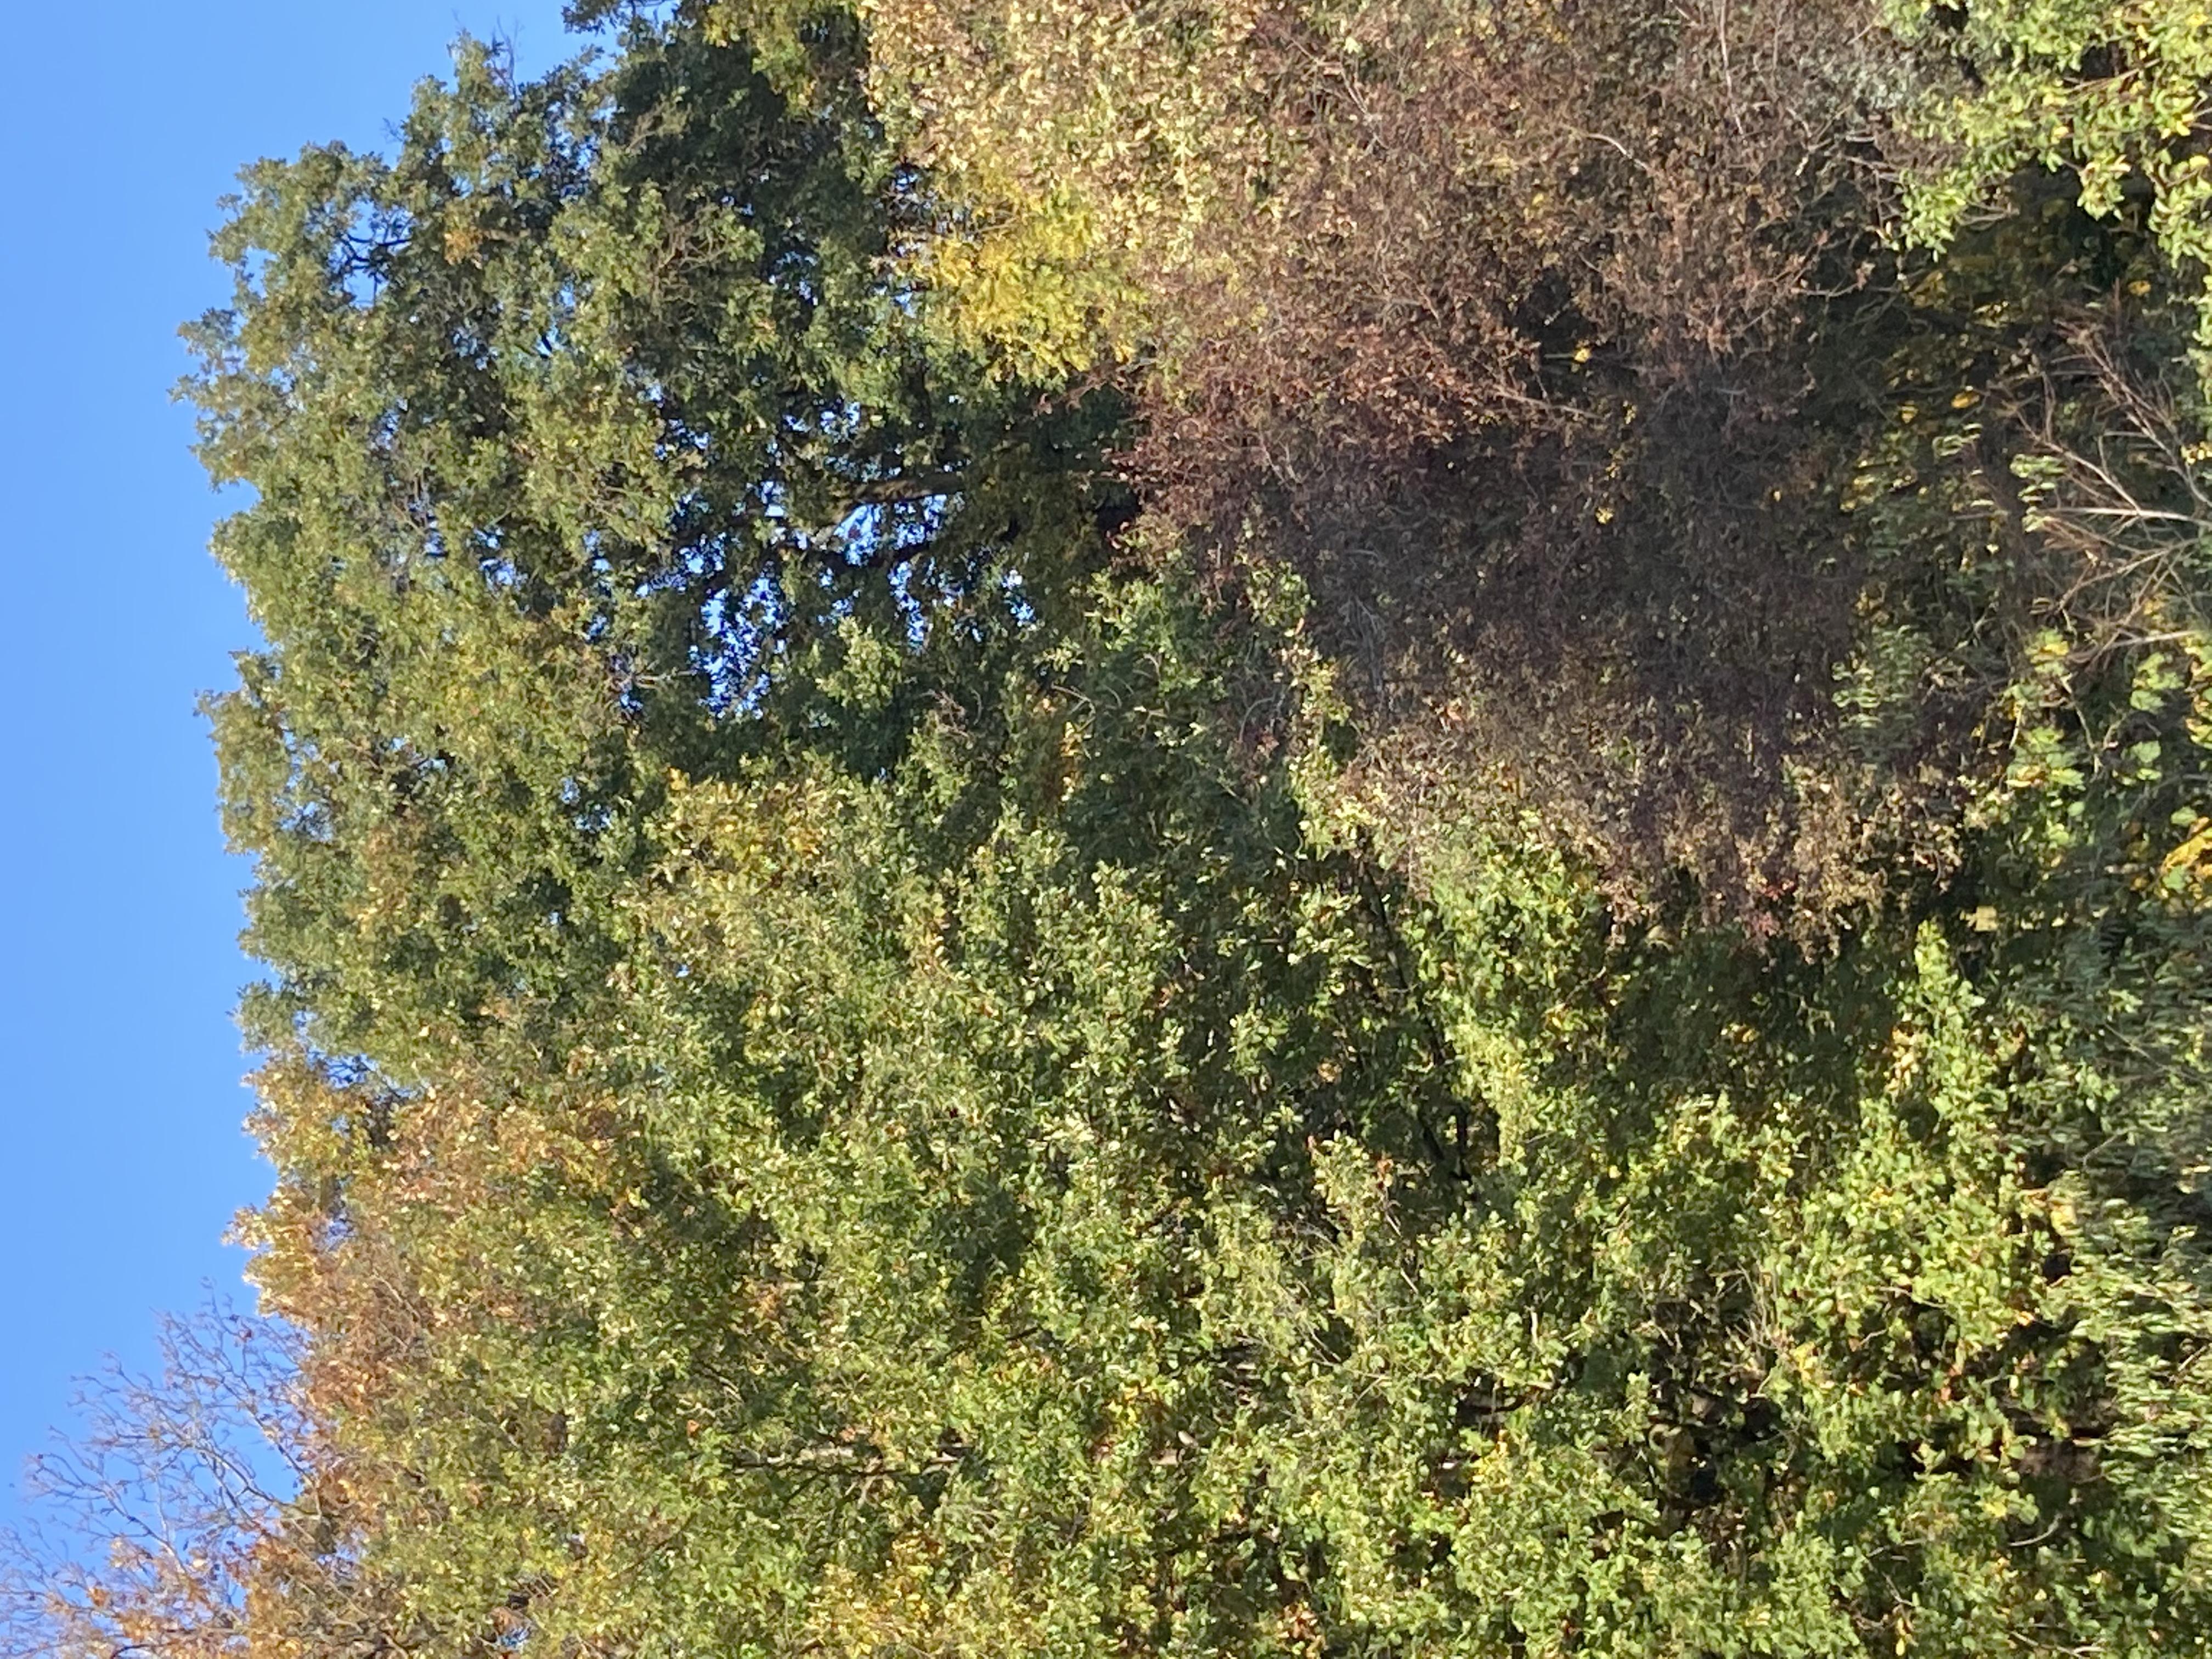 arbres en automne vus de la fenêtre